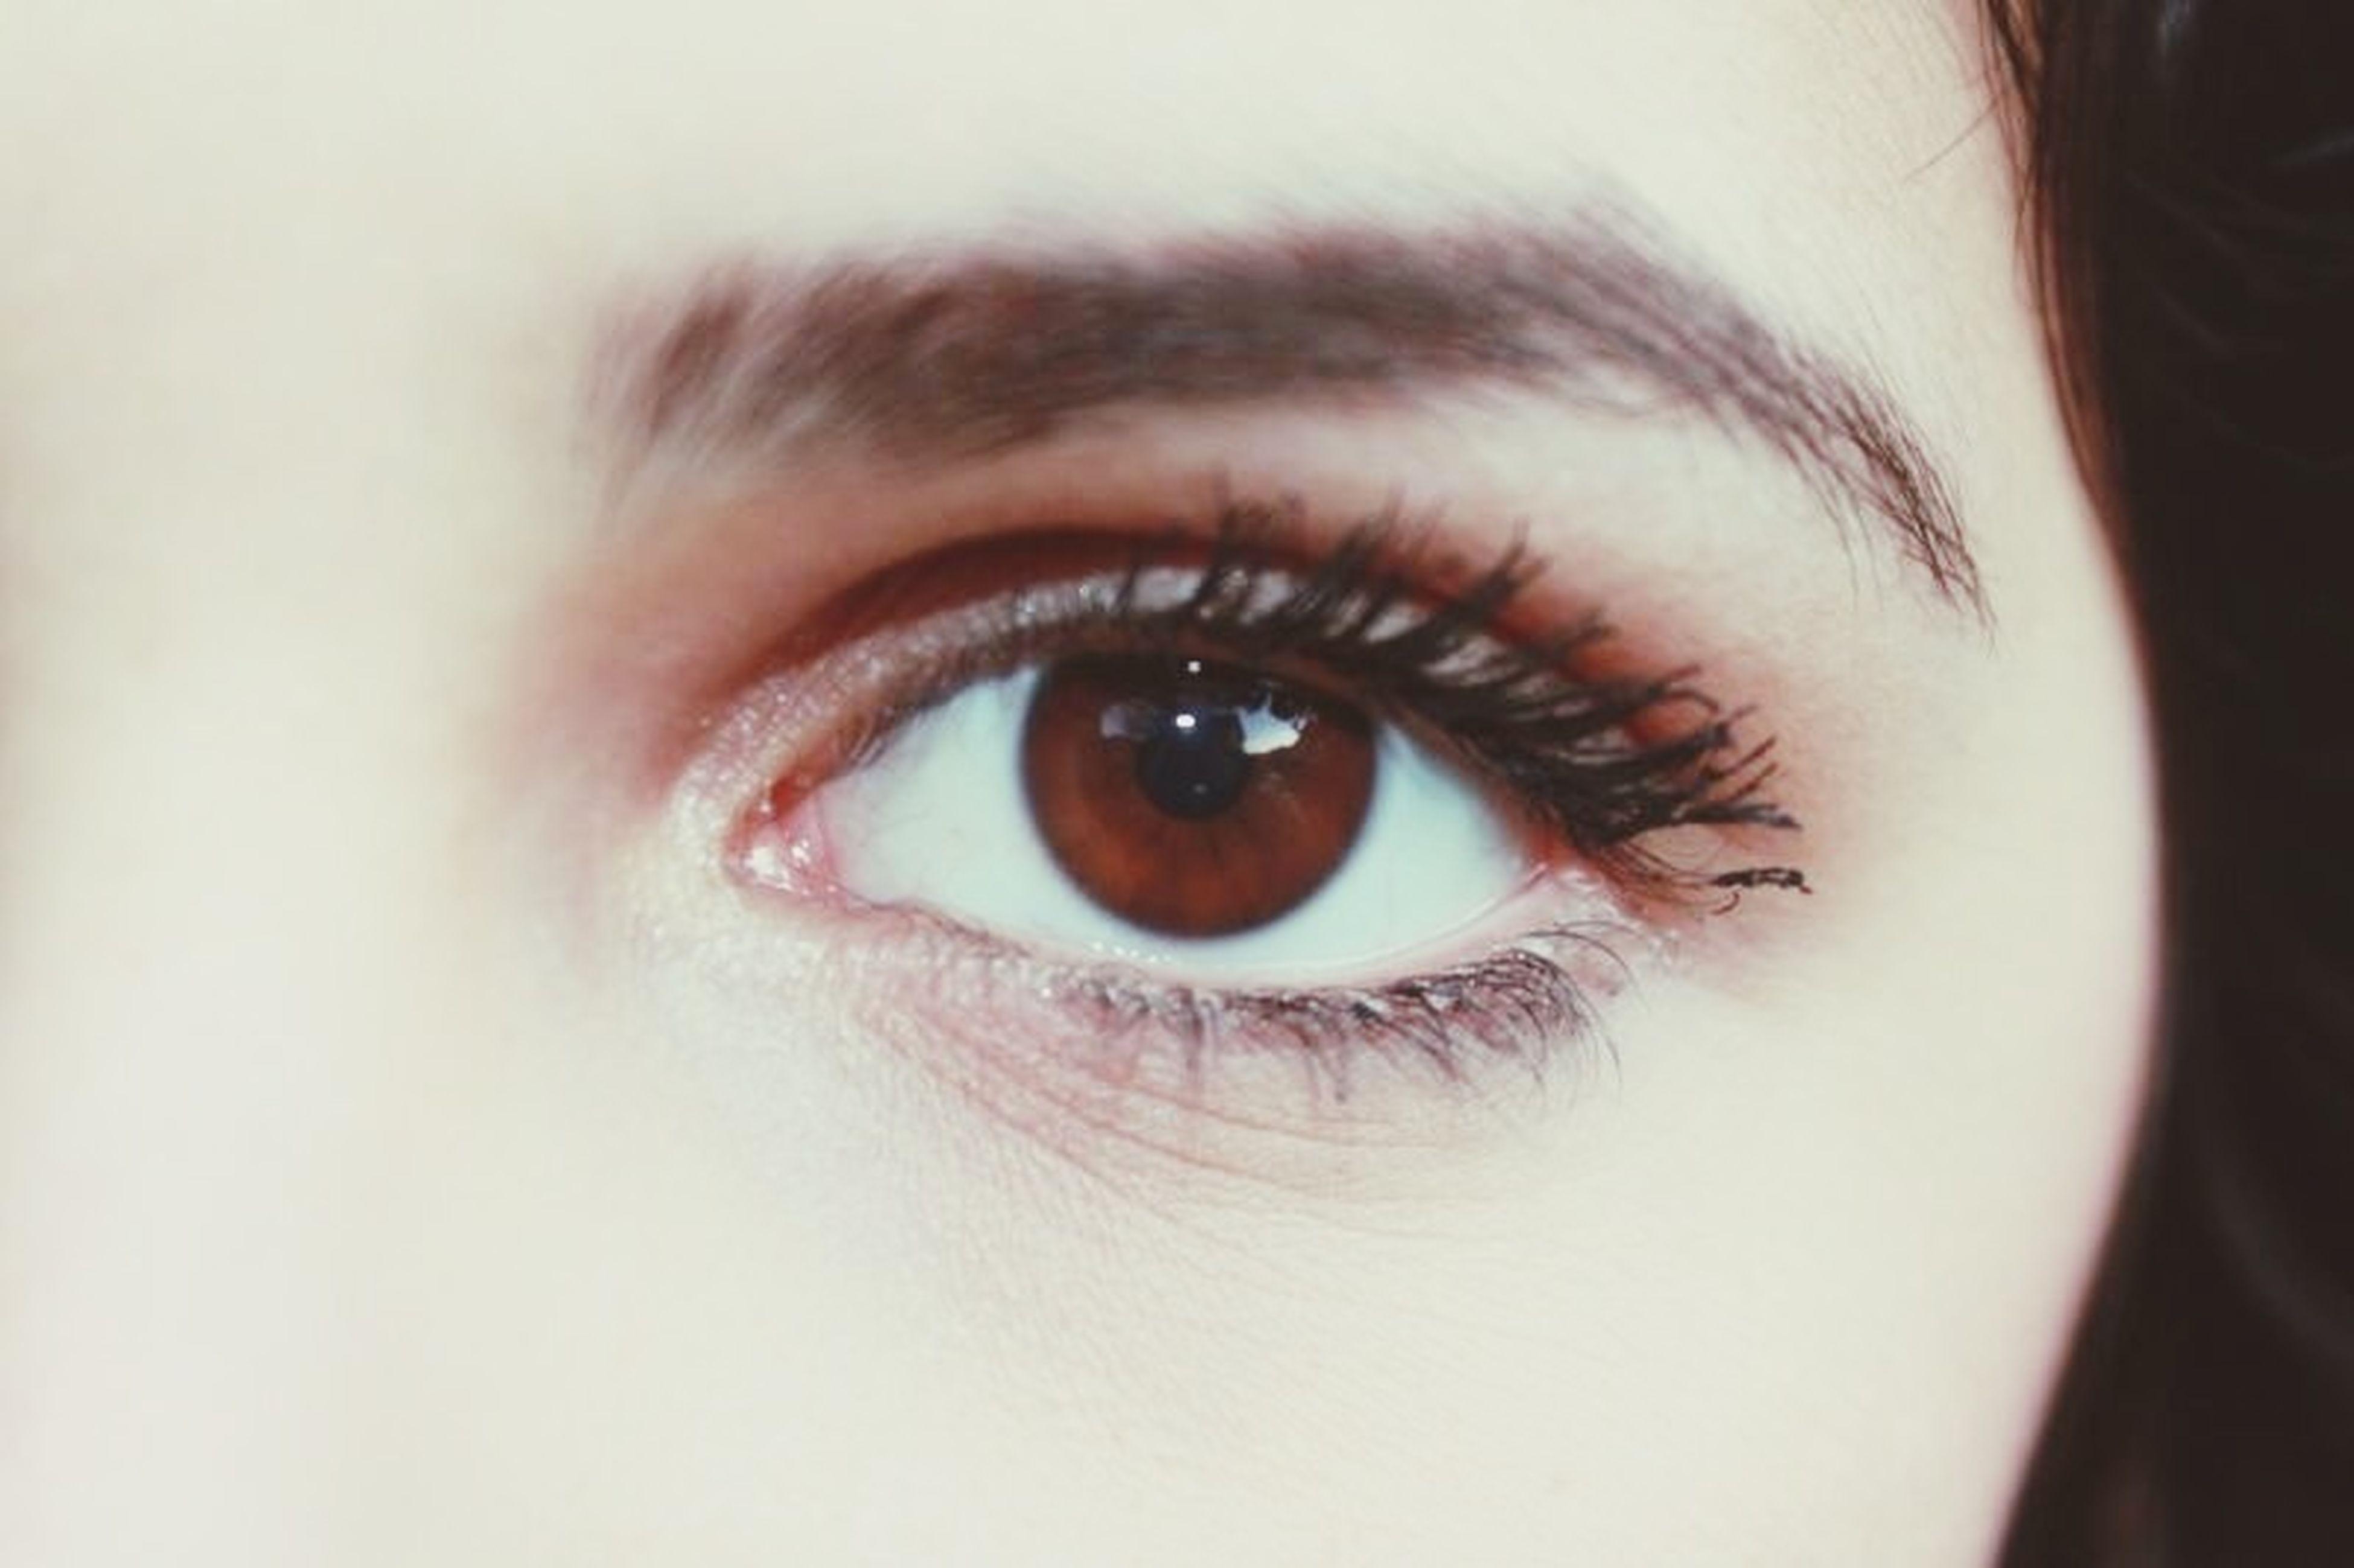 human eye, eyelash, close-up, looking at camera, portrait, eyesight, sensory perception, indoors, extreme close-up, human face, eyebrow, human skin, iris - eye, headshot, eyeball, lifestyles, part of